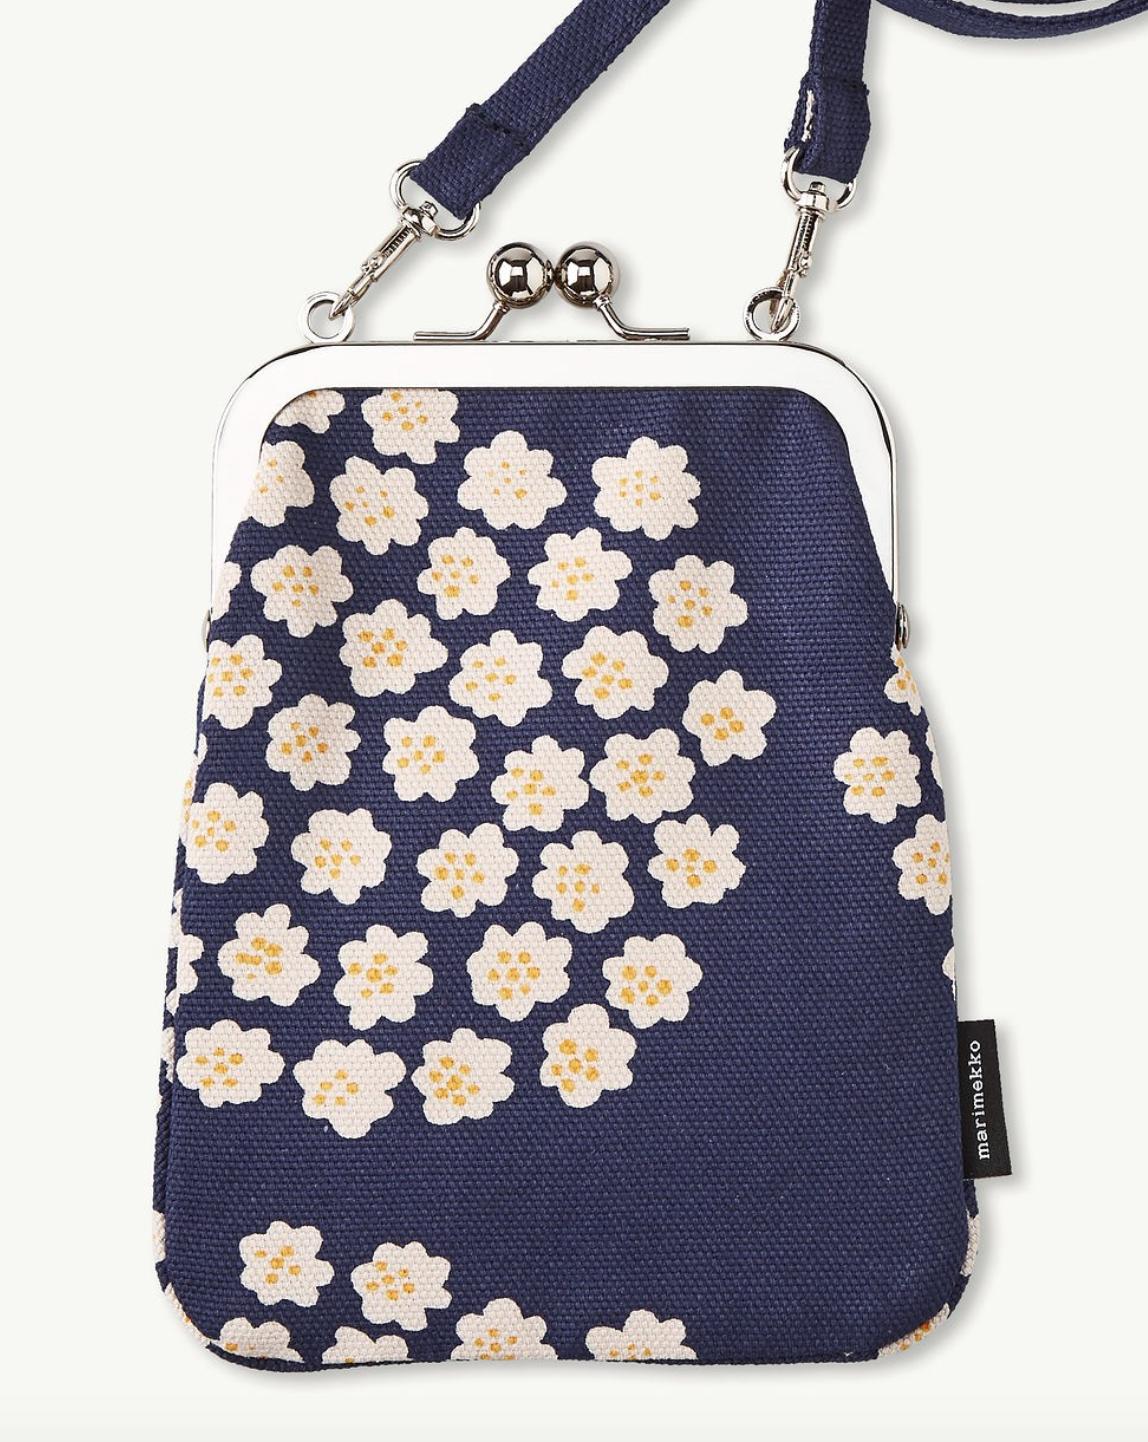 Marimekko Rimmi bourse sac, de la Finlande Neuf avec étiquettes, bleu puketti